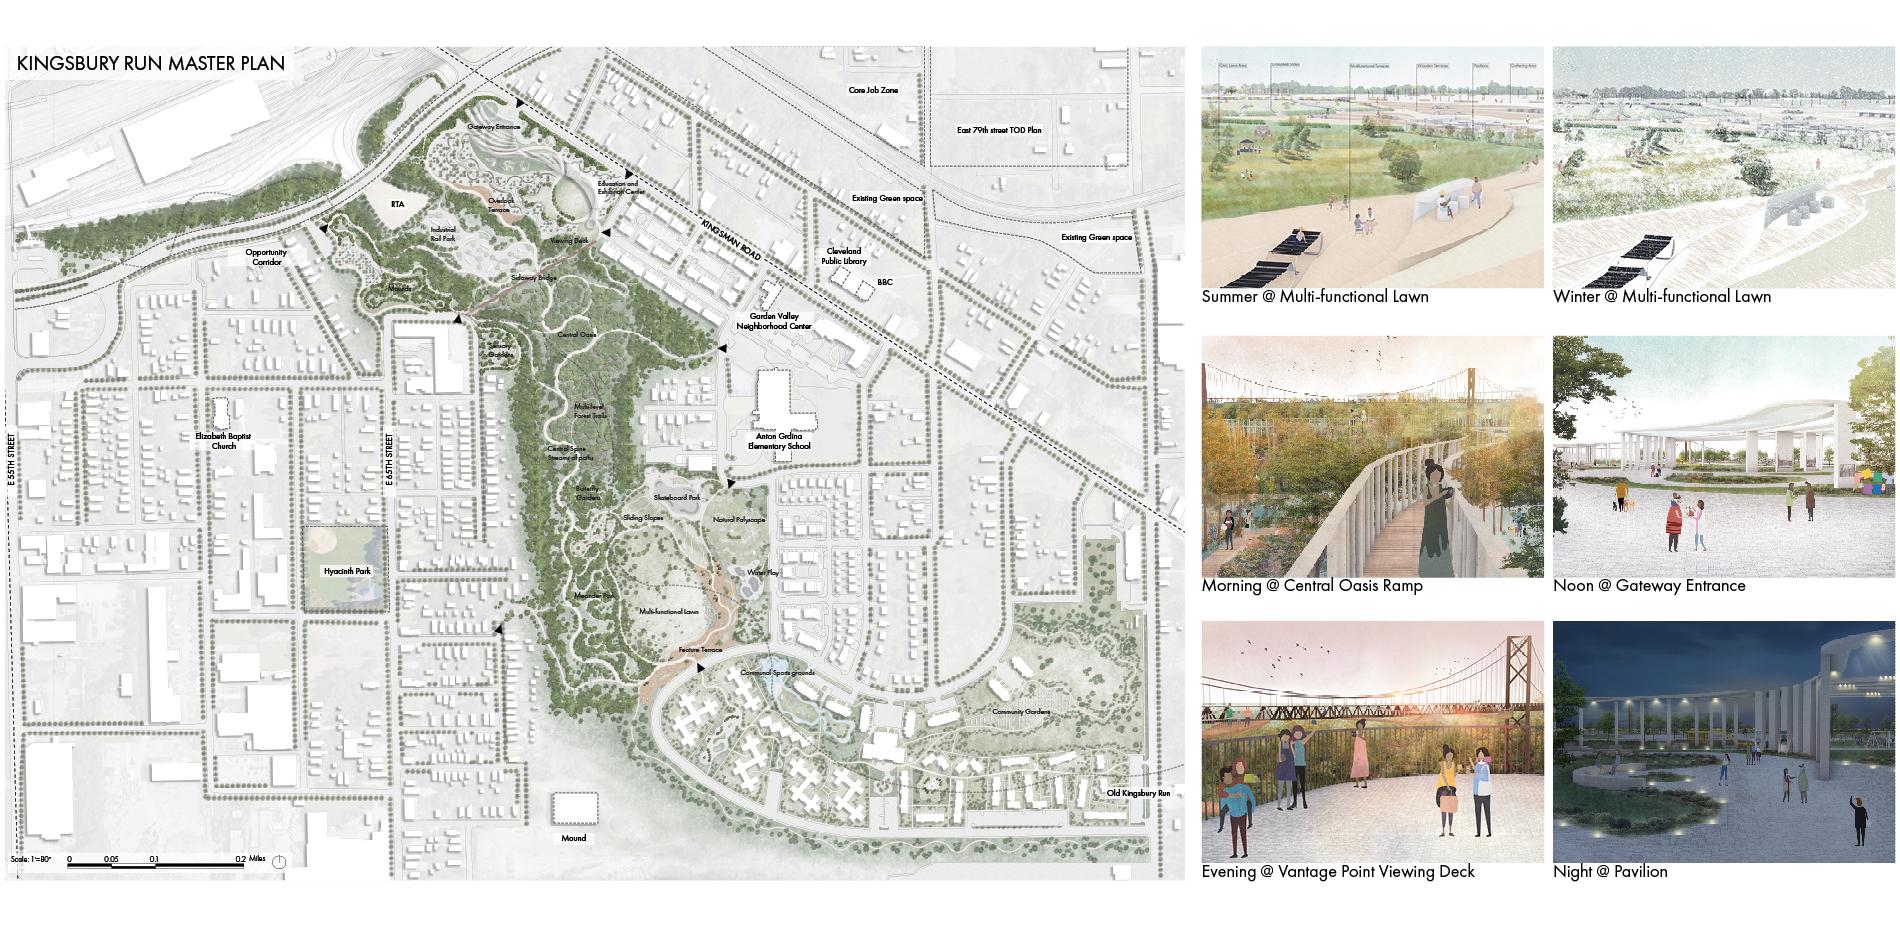 Kingsbury Run Master Plan & Series of Perspectives